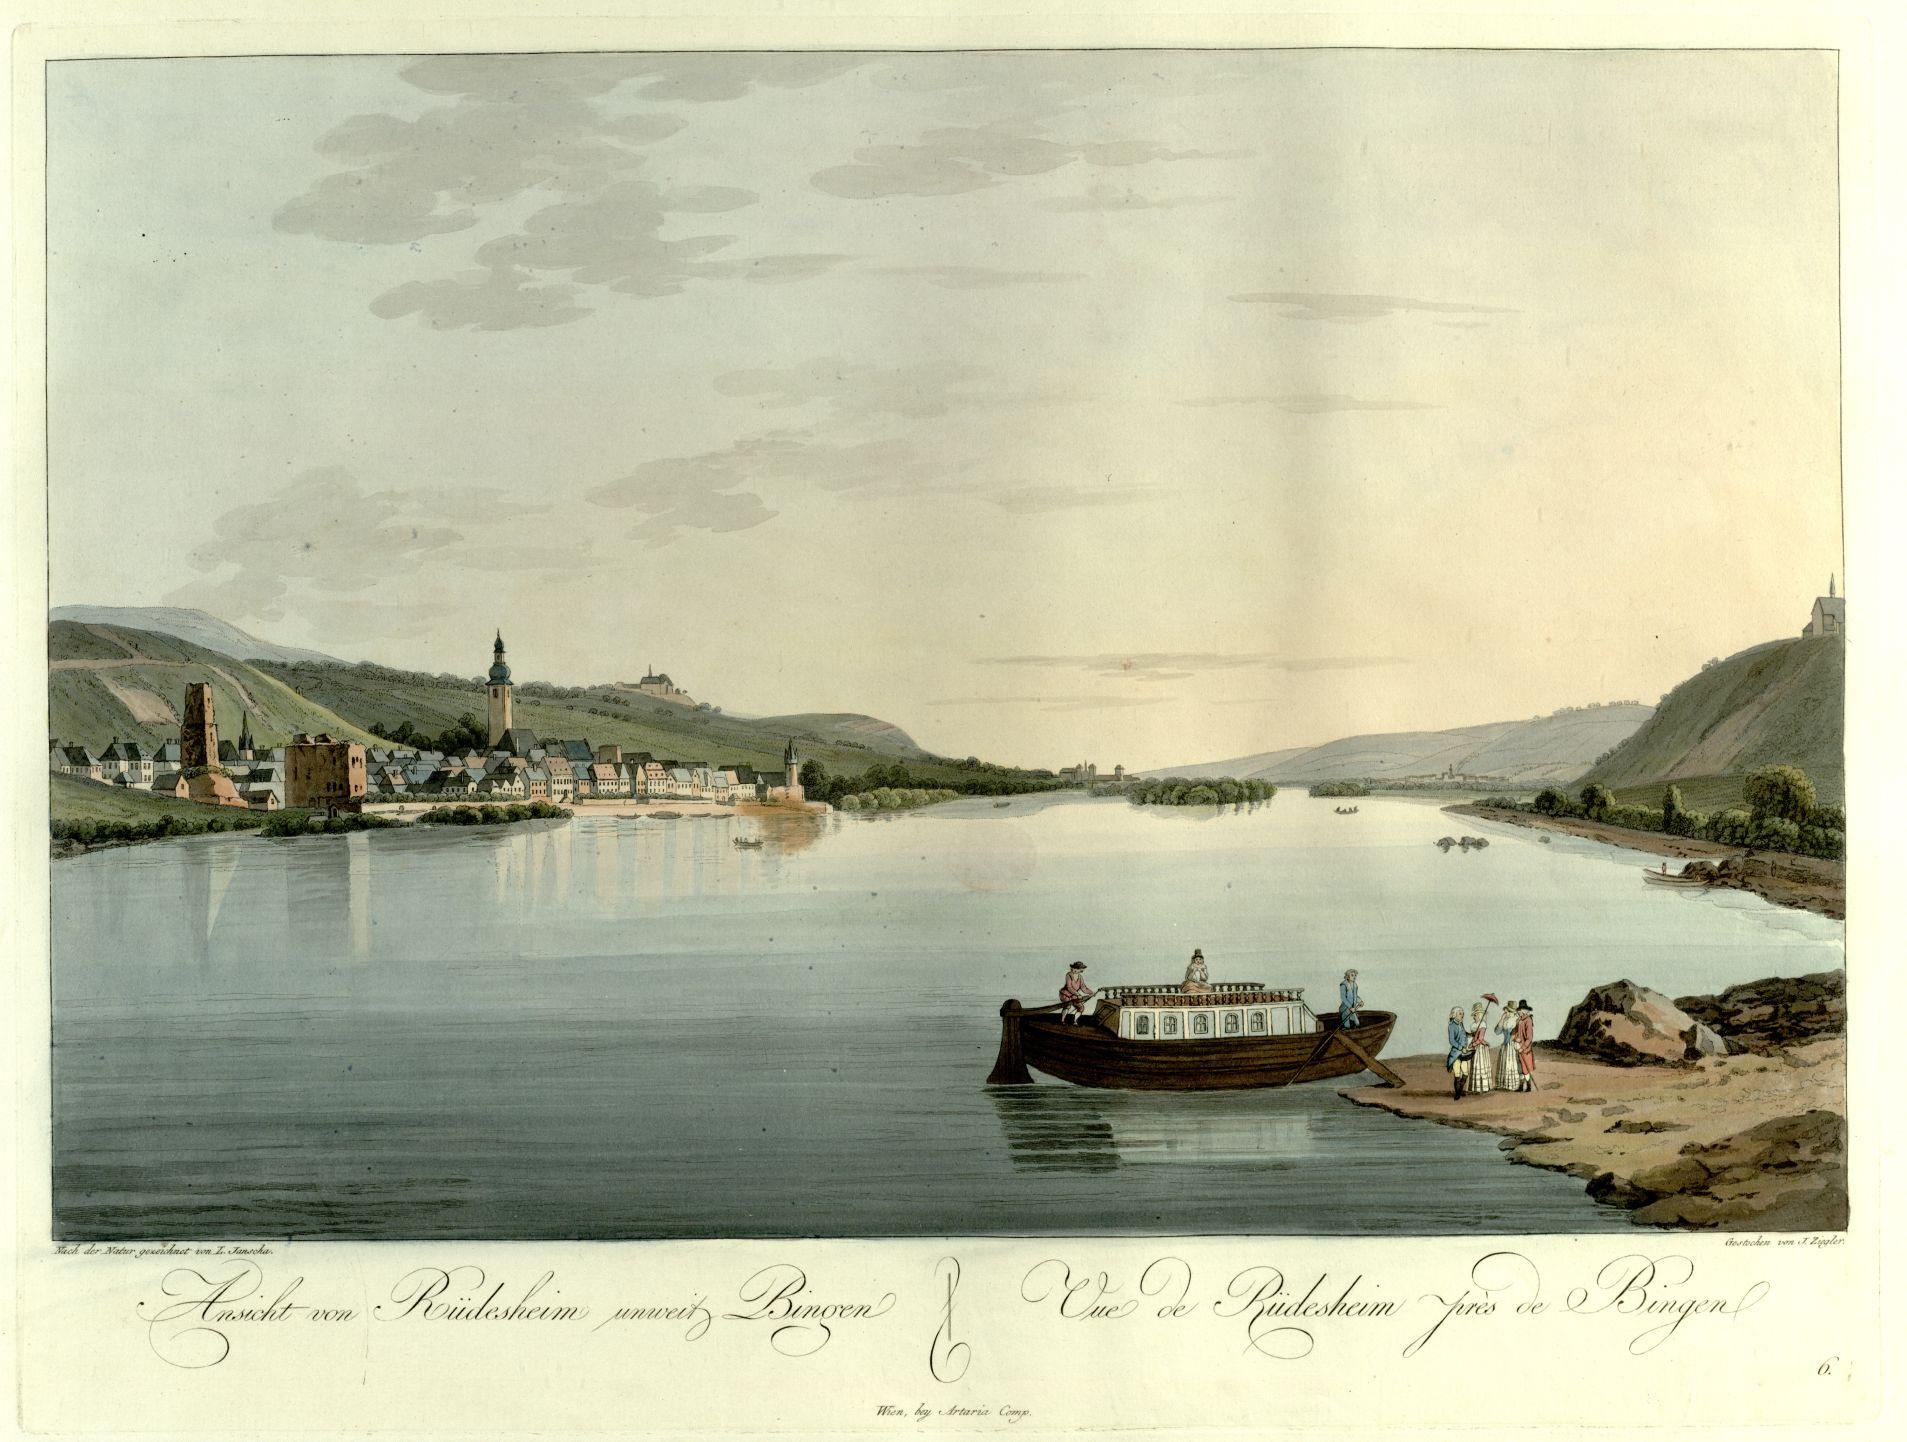 A view of Rudesheim and Bingen on the Rhine